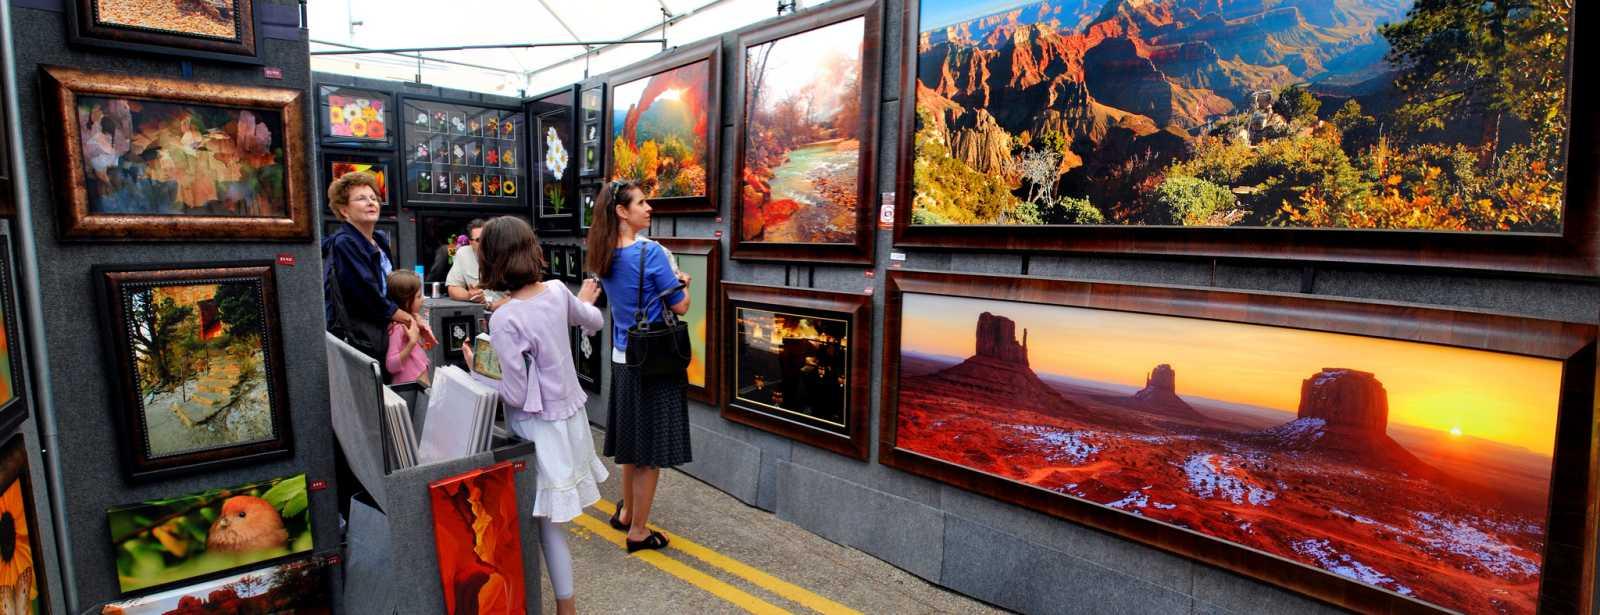 Stillwater Arts Festival Day